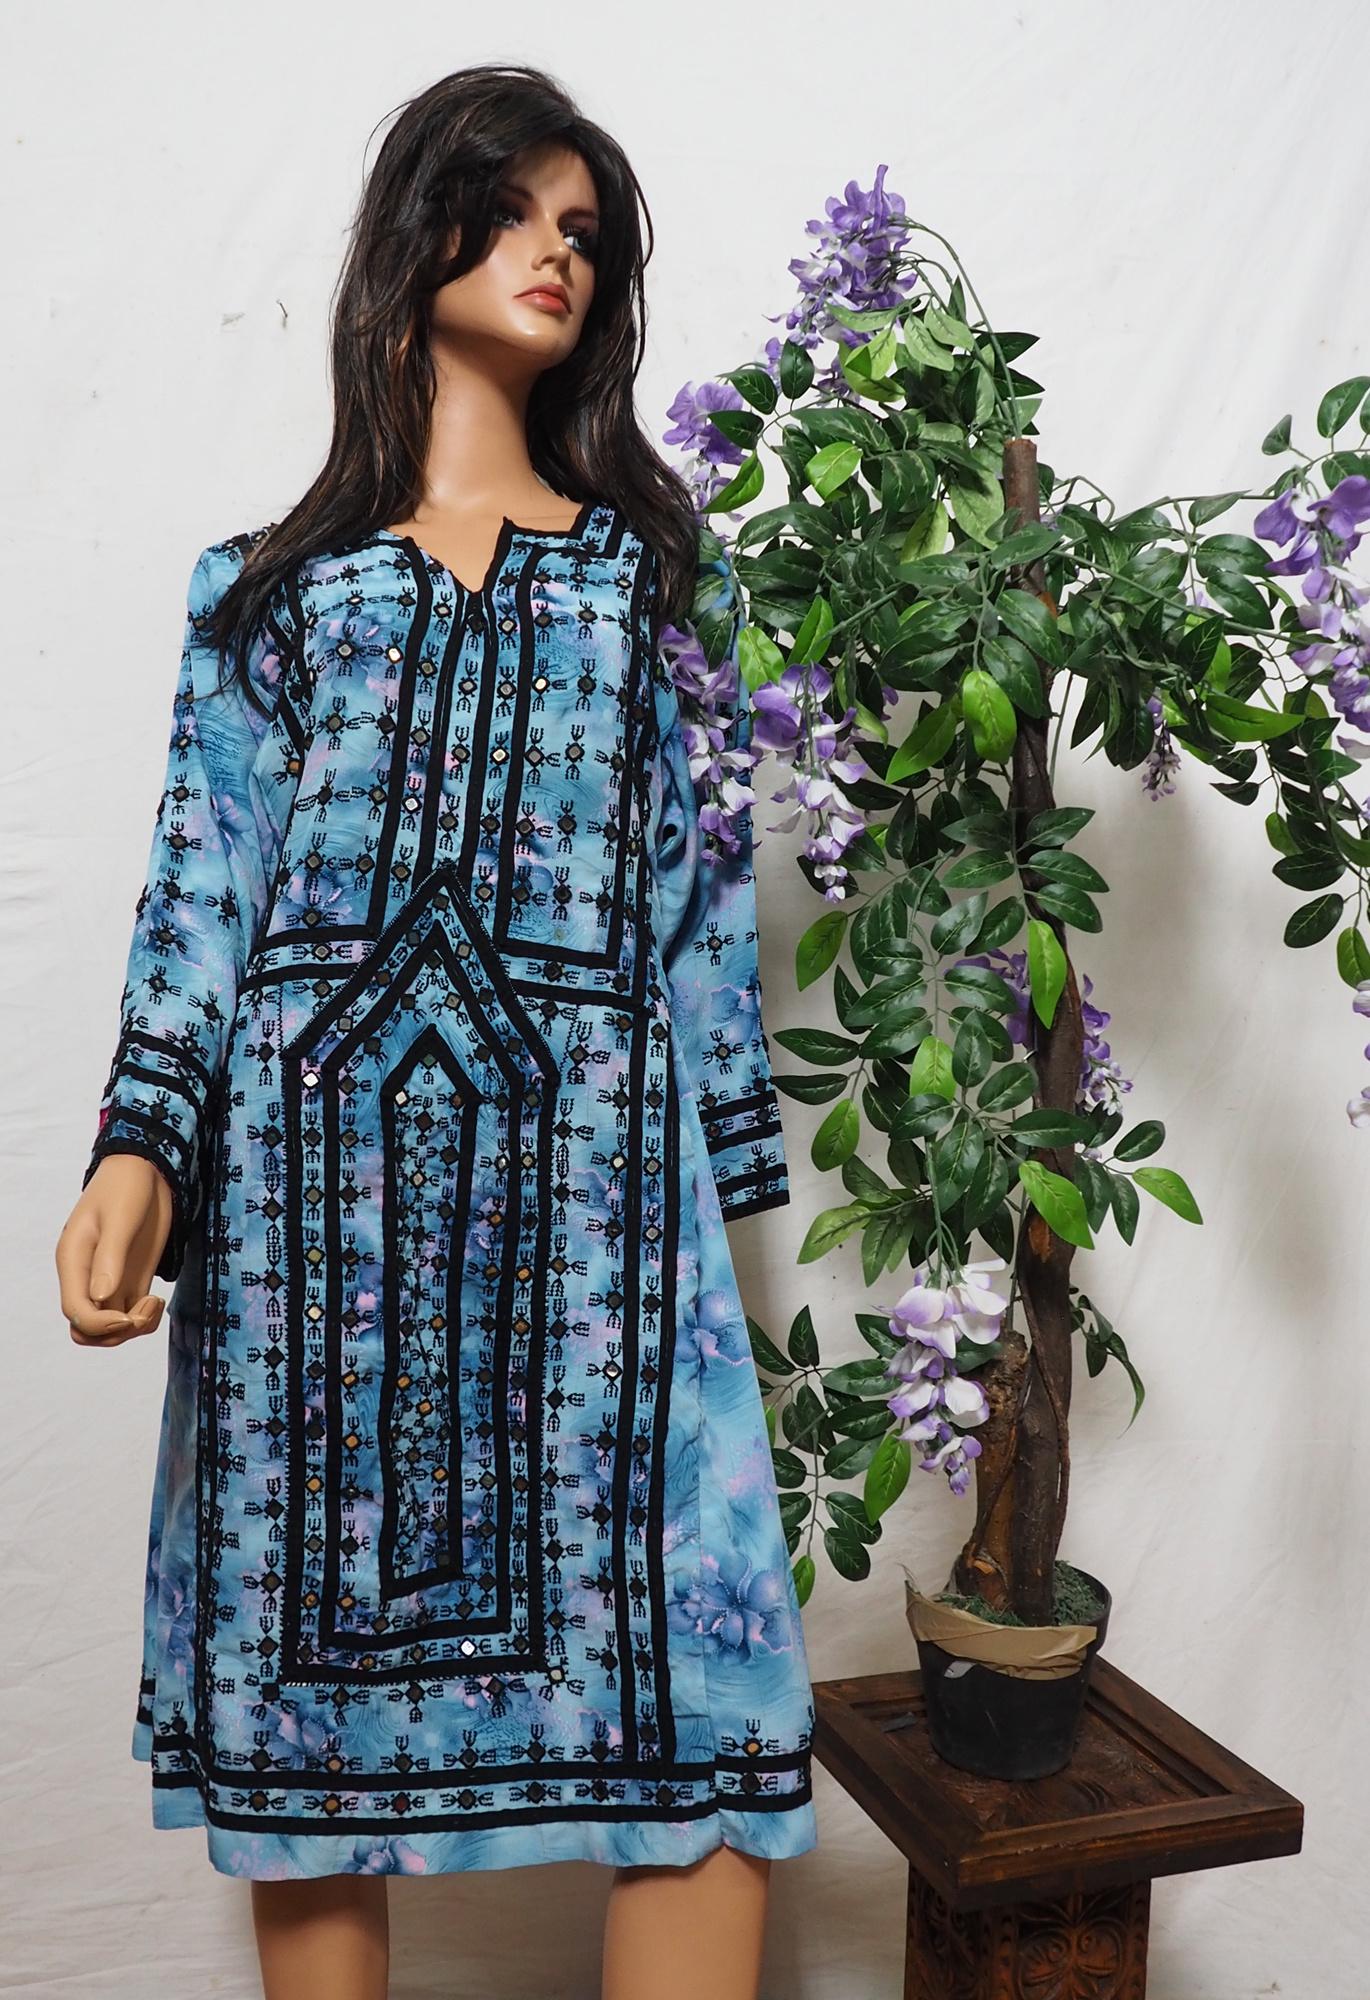 alt Beloschi Frauen Hochzeit Kleid Belutschistan Pakistan Afghanistan Nr-21/10